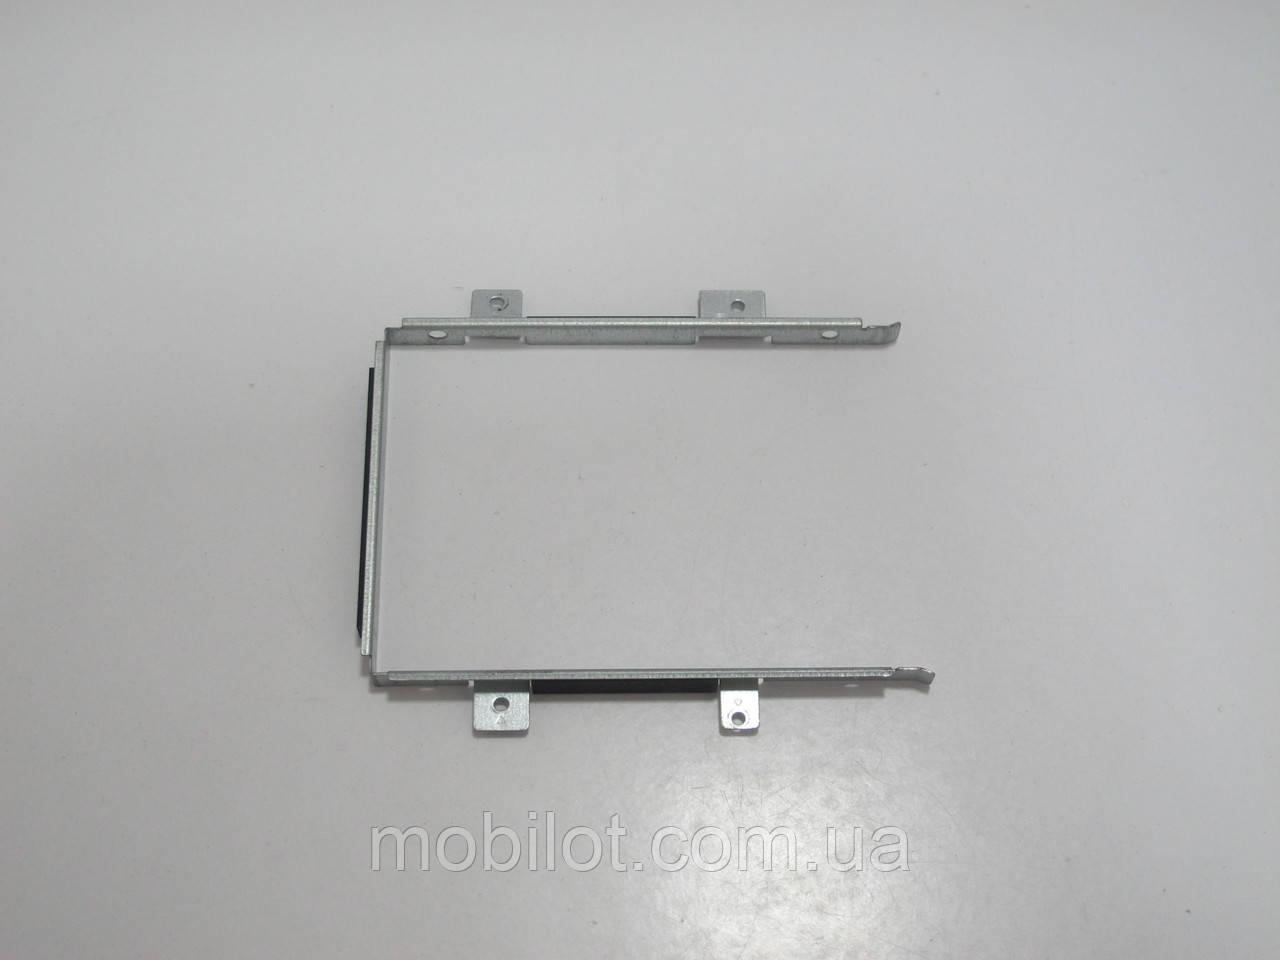 Корпус (карман, корзина, крепление) для HDD Asus S300C (NZ-5693)